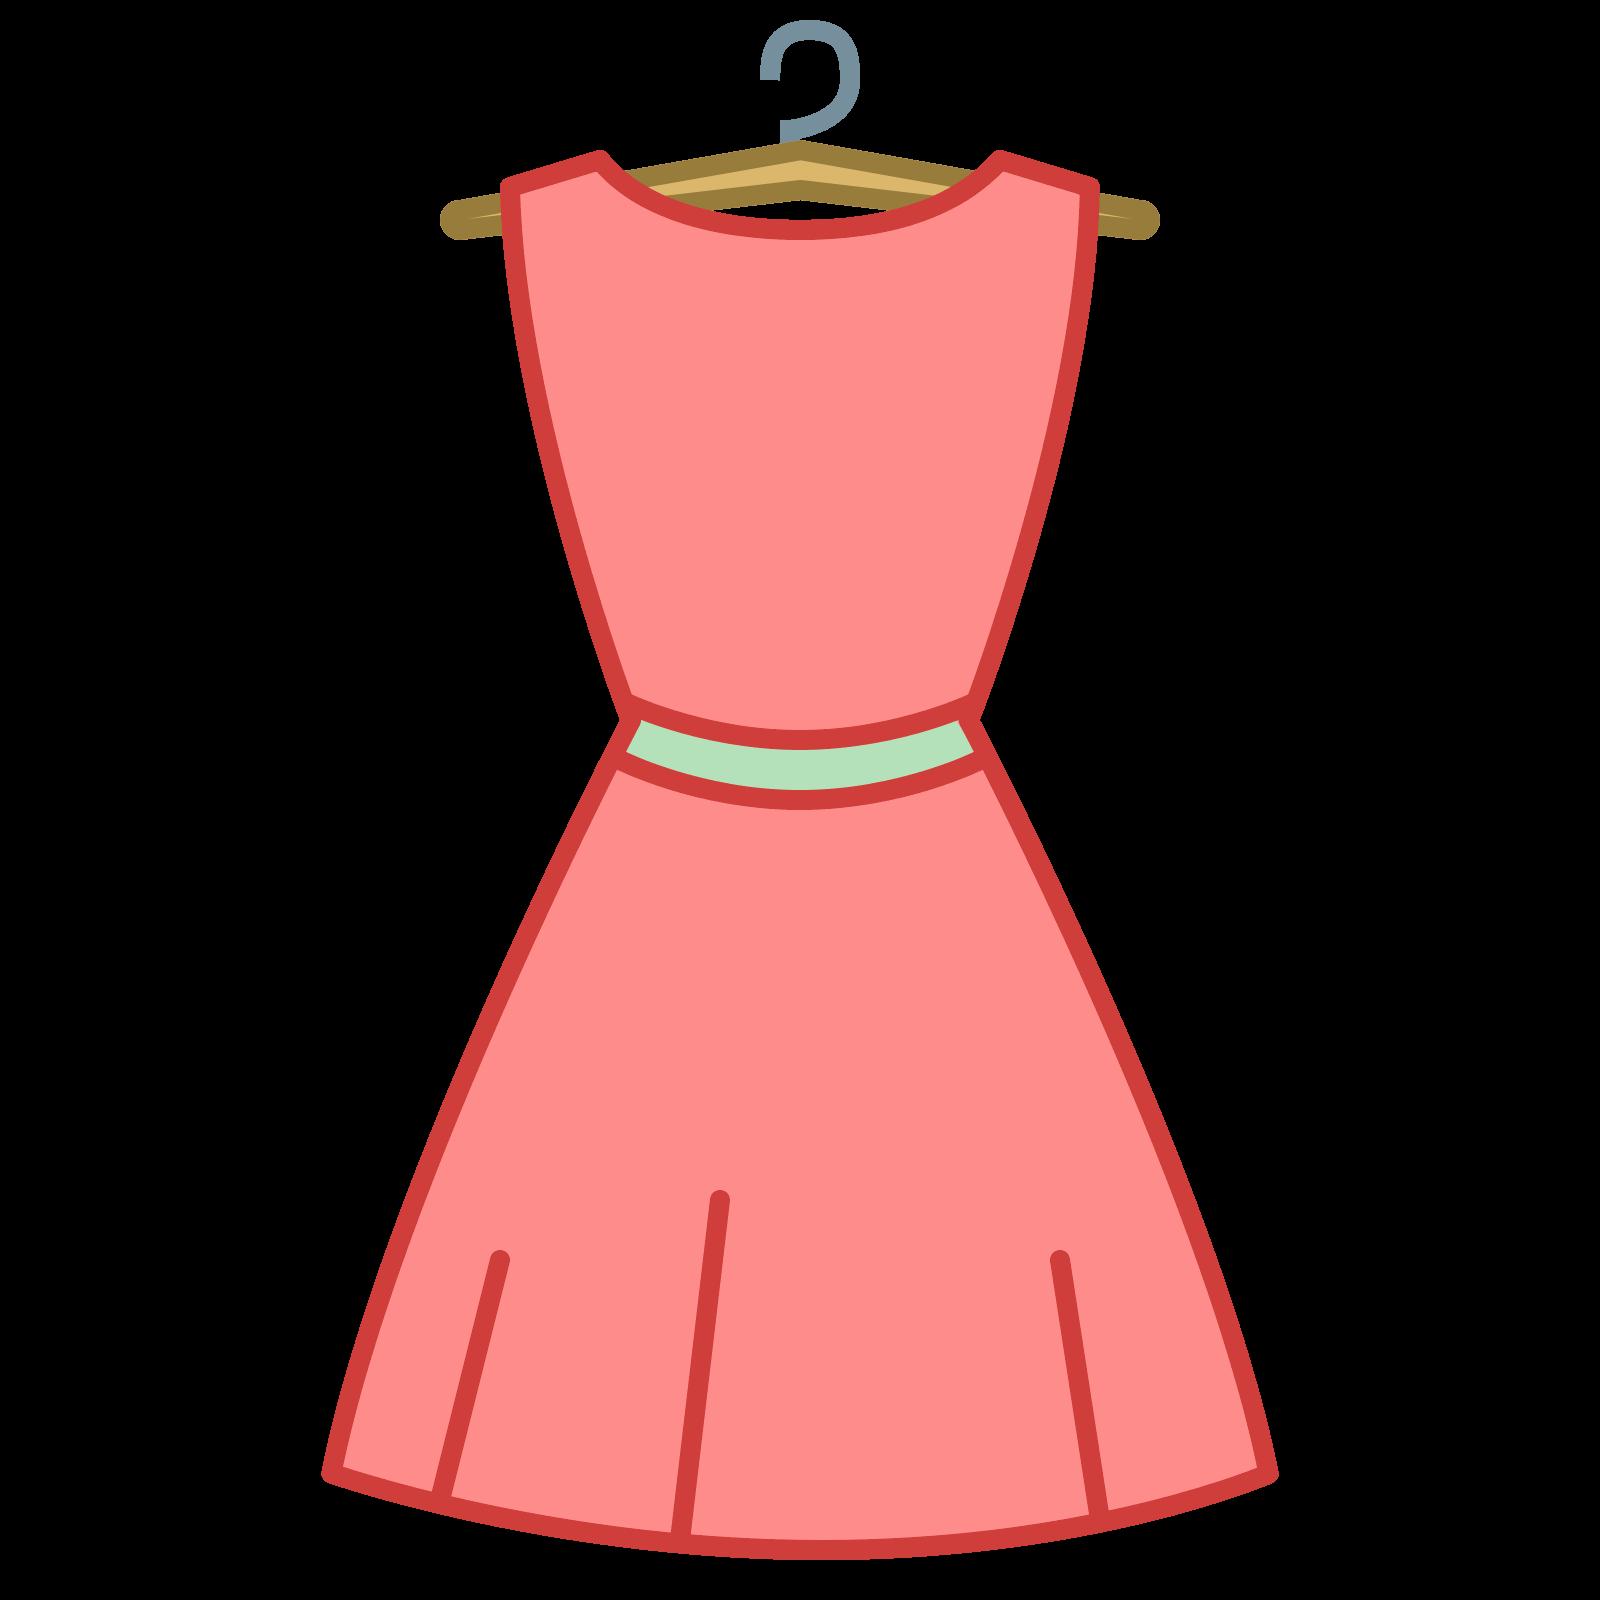 dress clipart icon 14